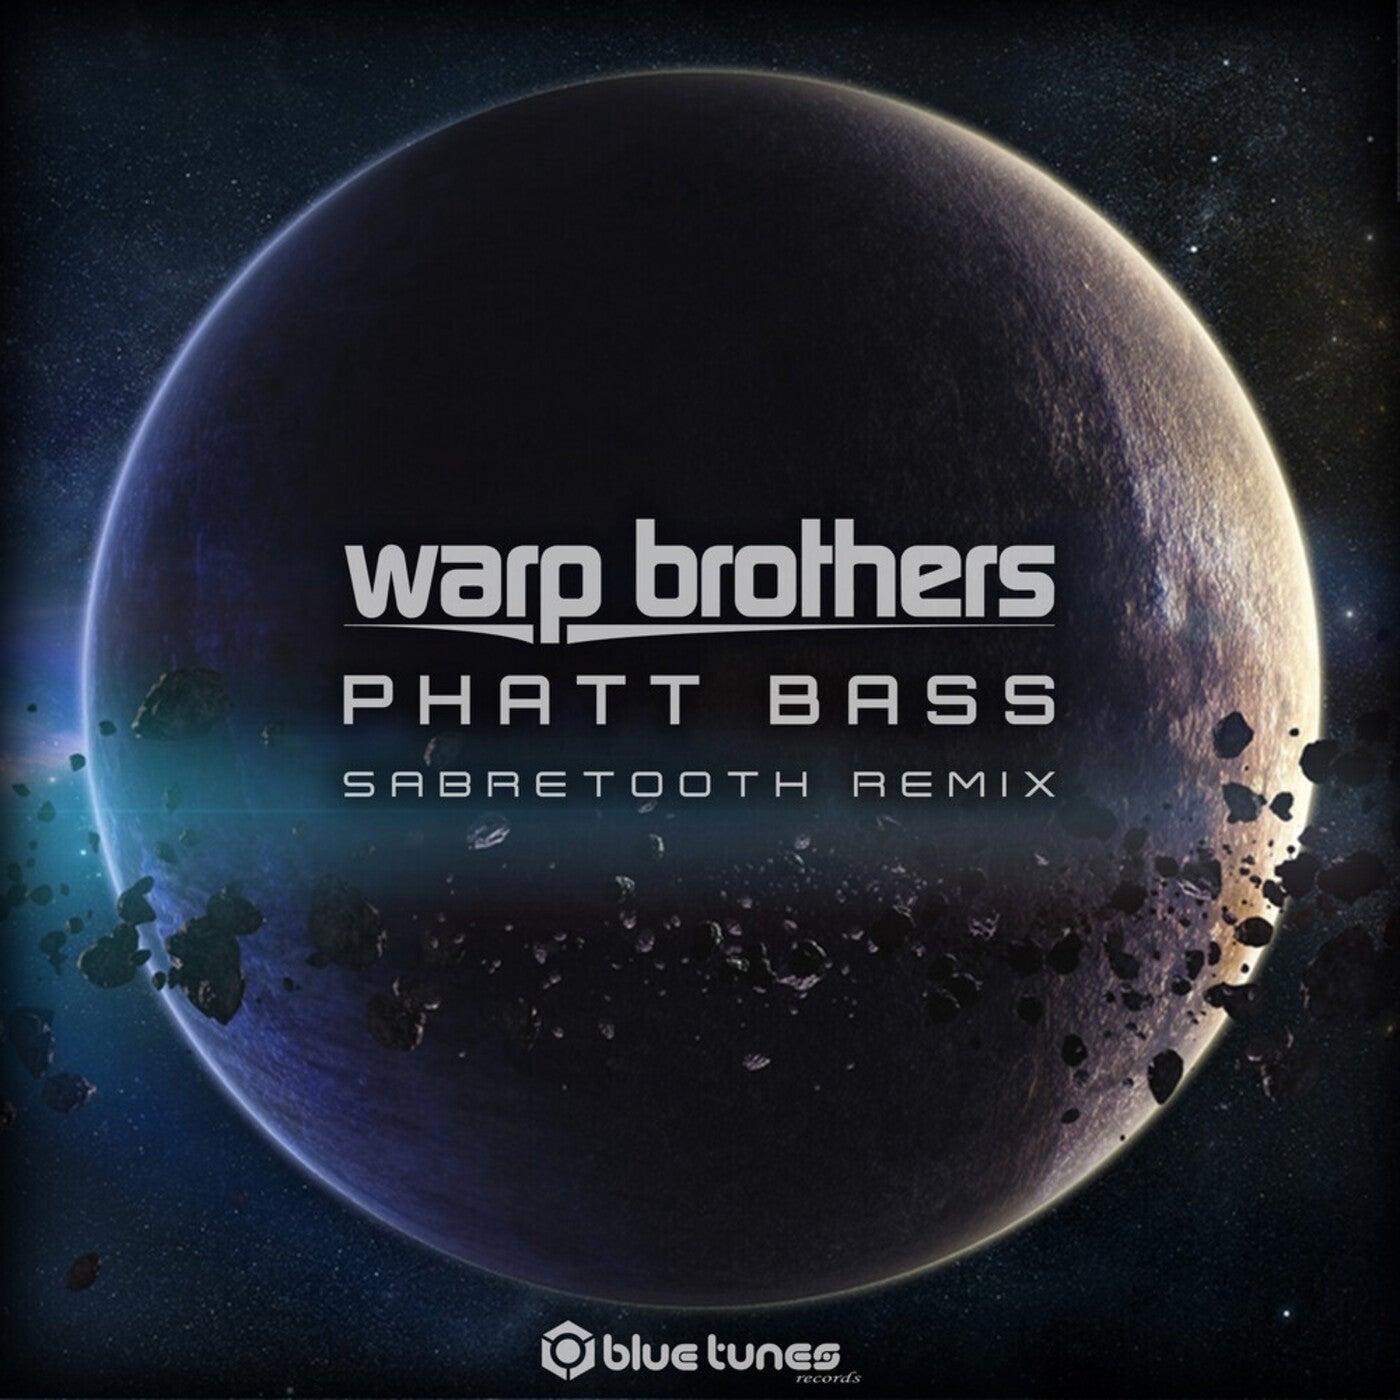 Phatt Bass (Sabretooth Remix)